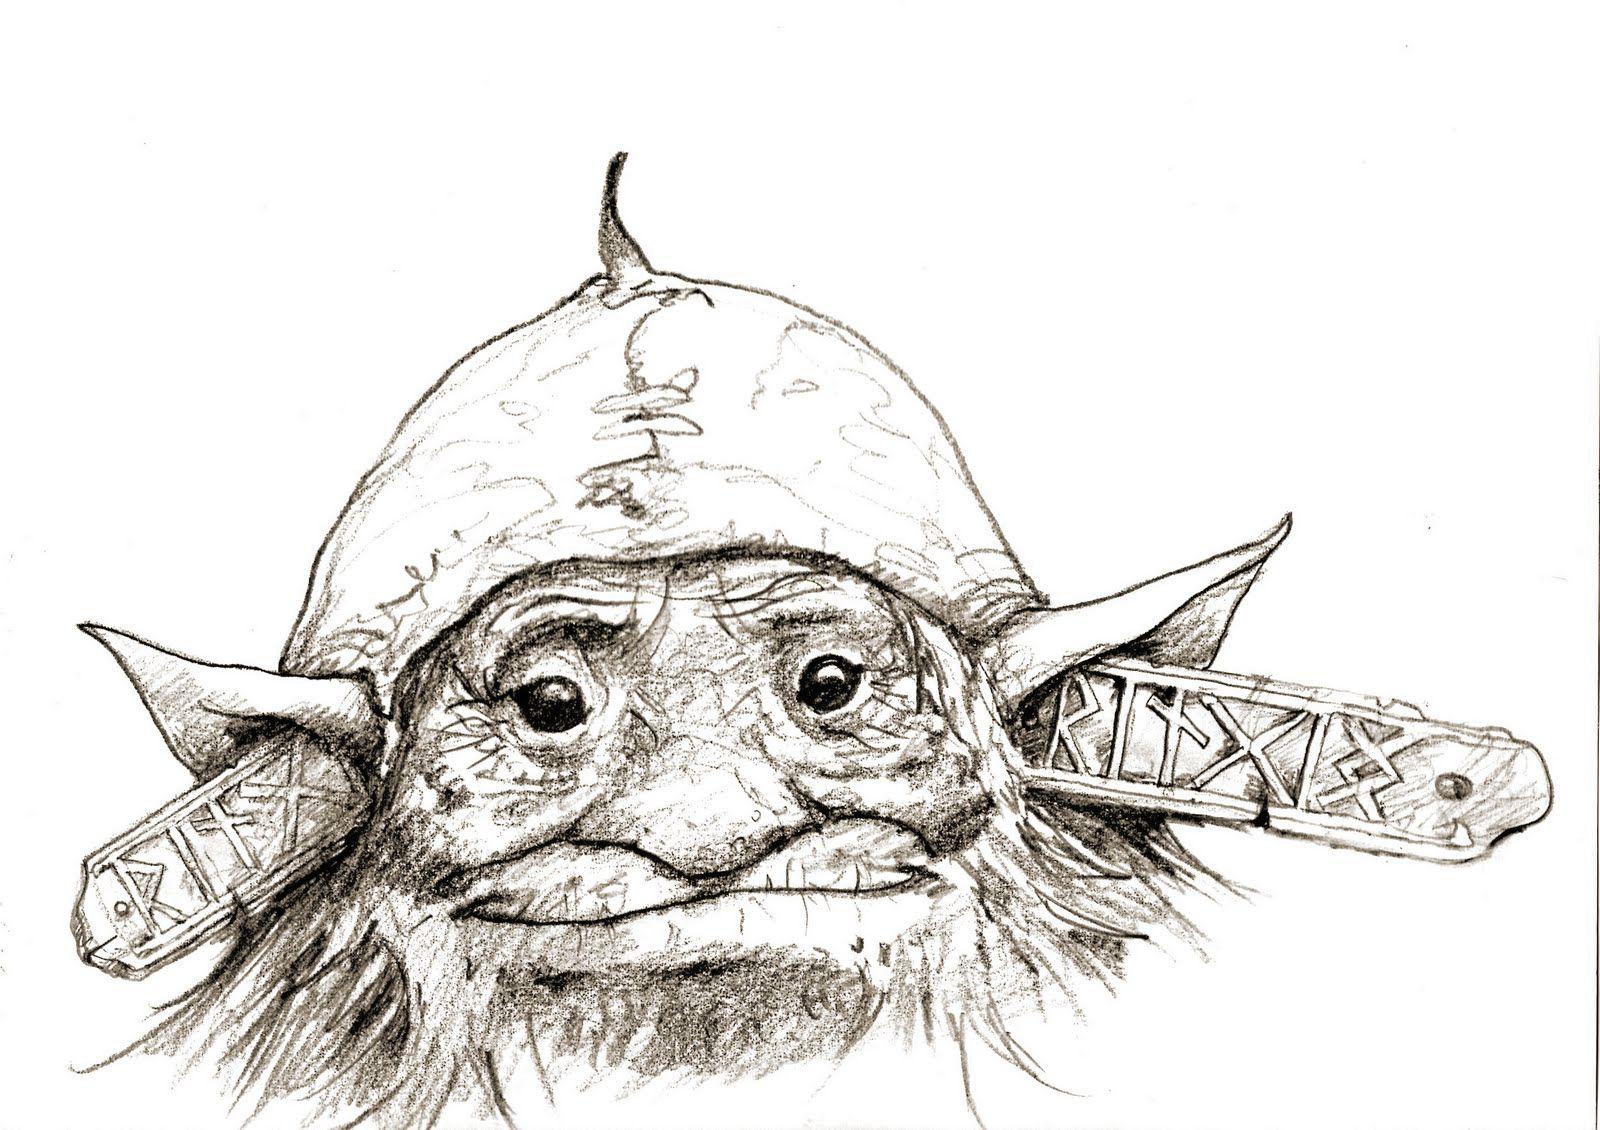 Troll+sketch+by+Brian+Froud.jpg (1600×1130)